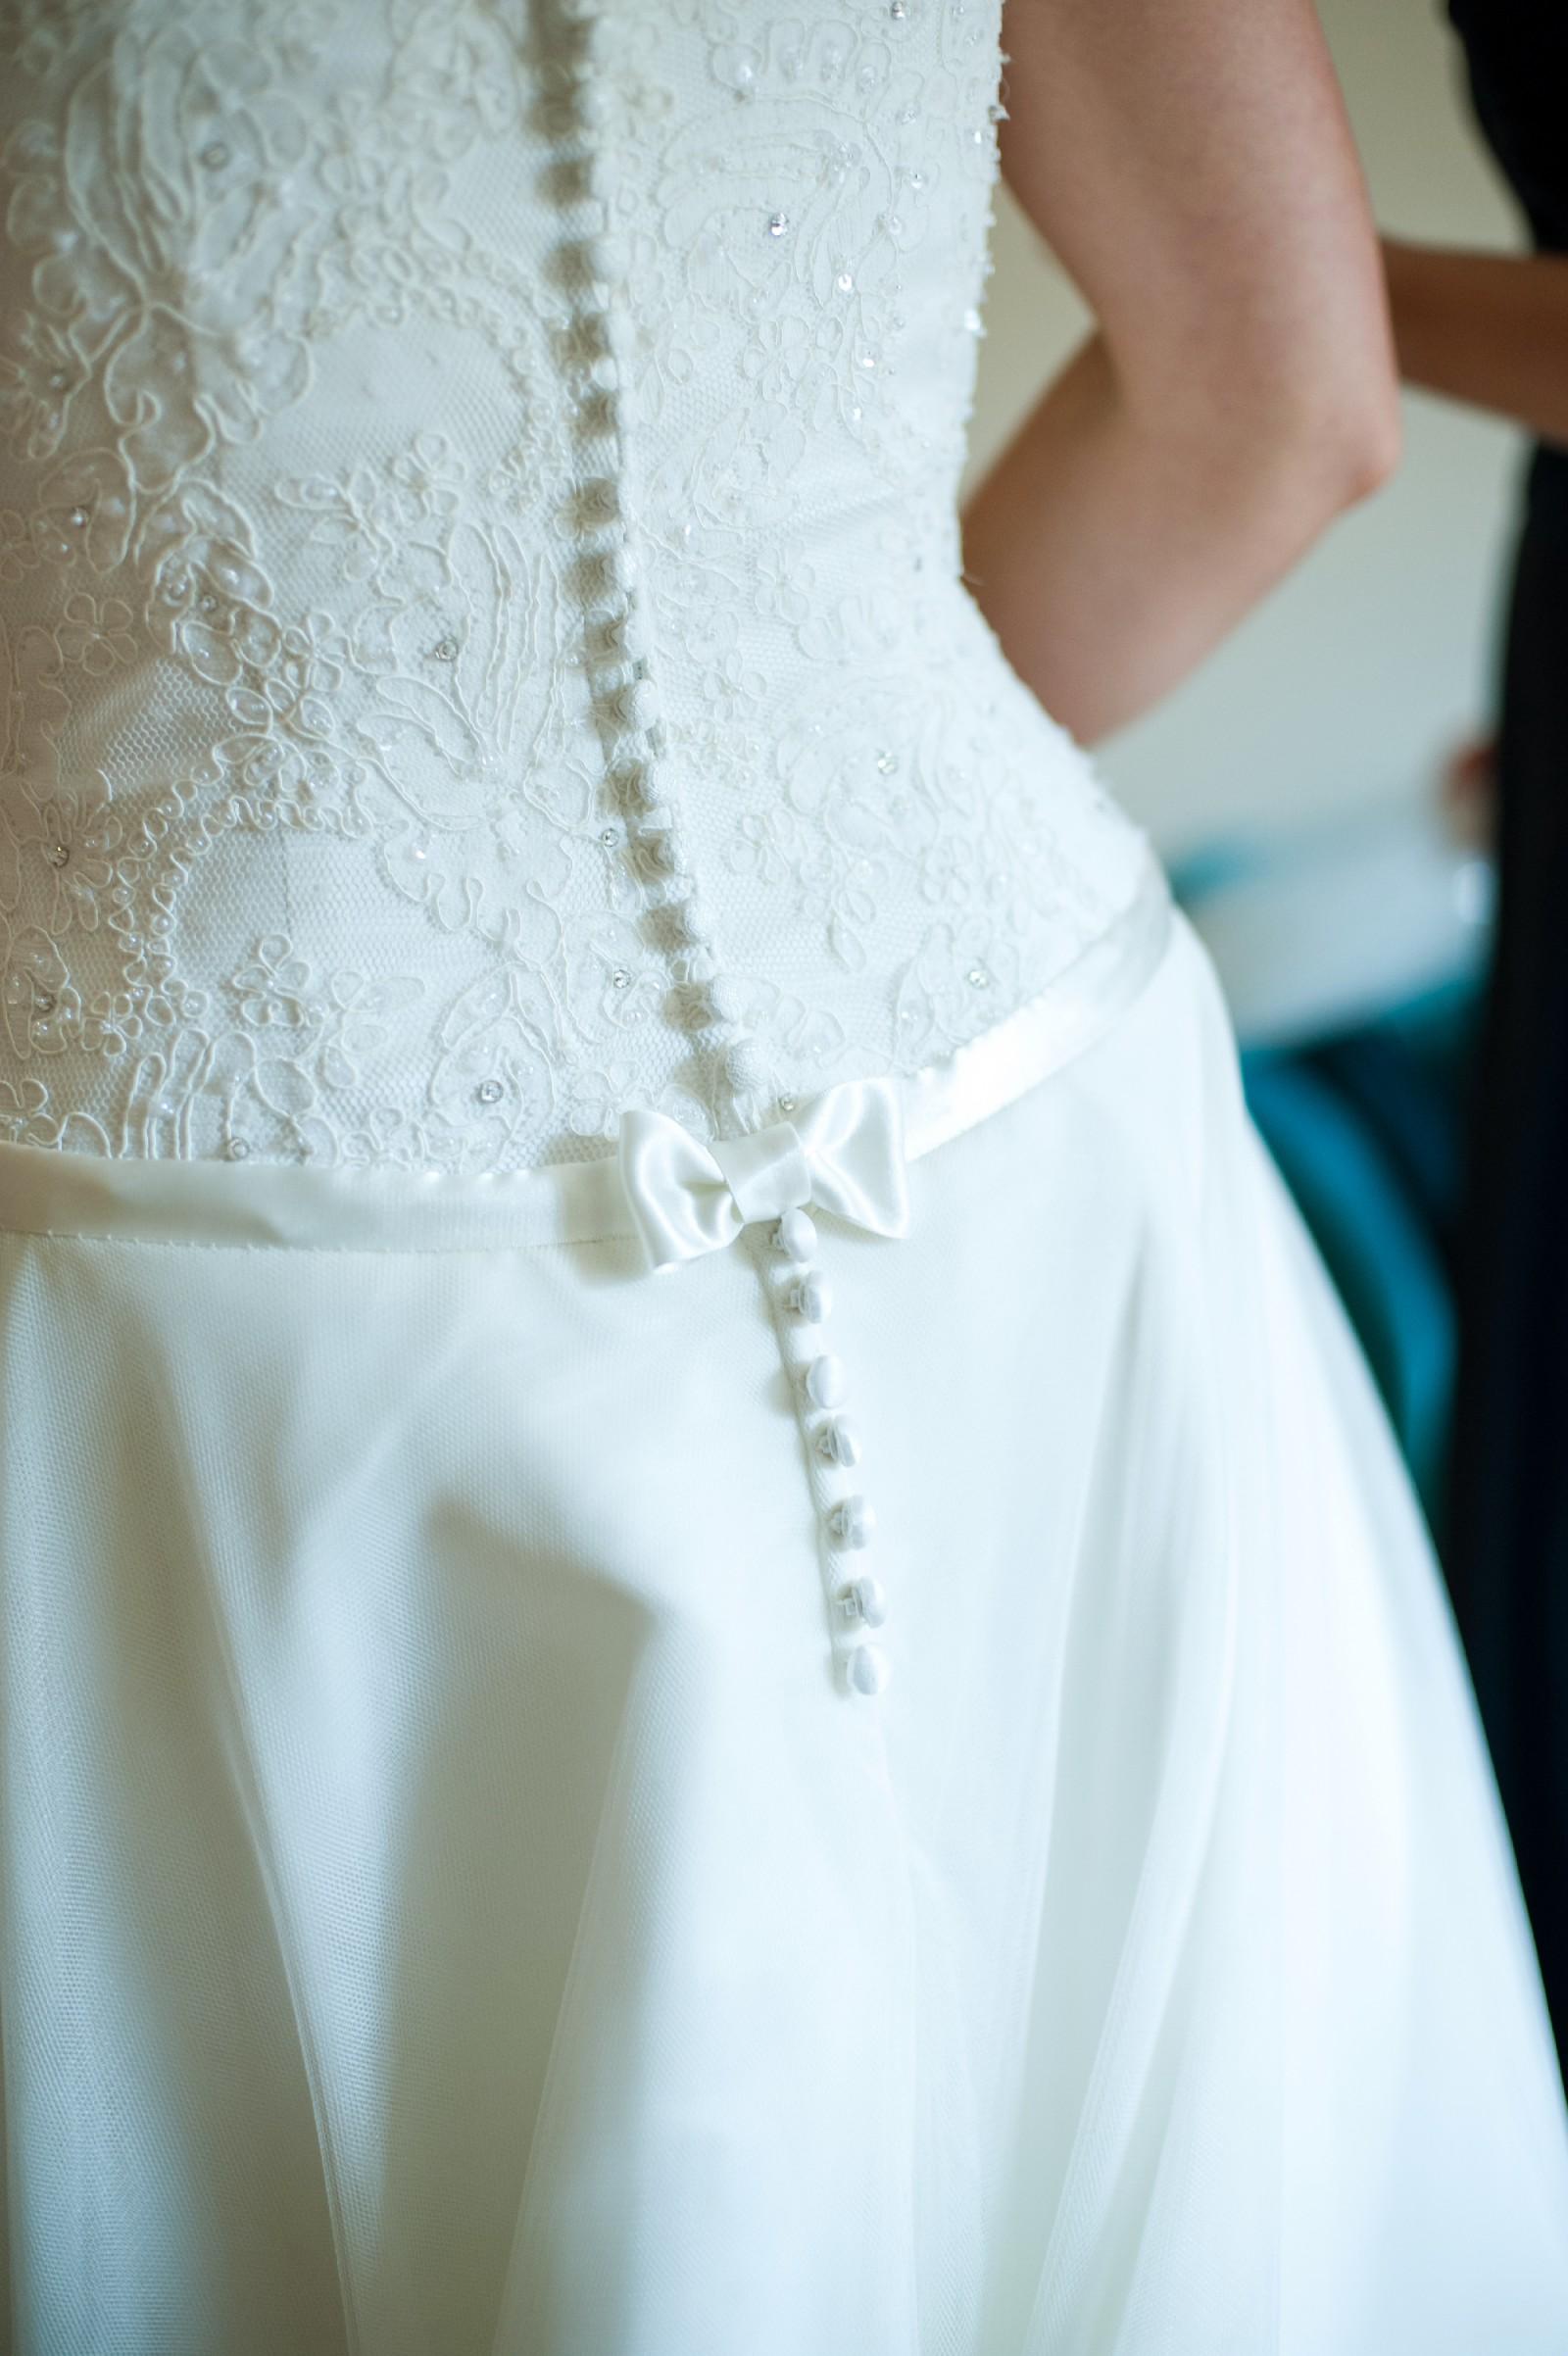 Madeline Issac James Aurora Second Hand Wedding Dress on Sale 84% Off